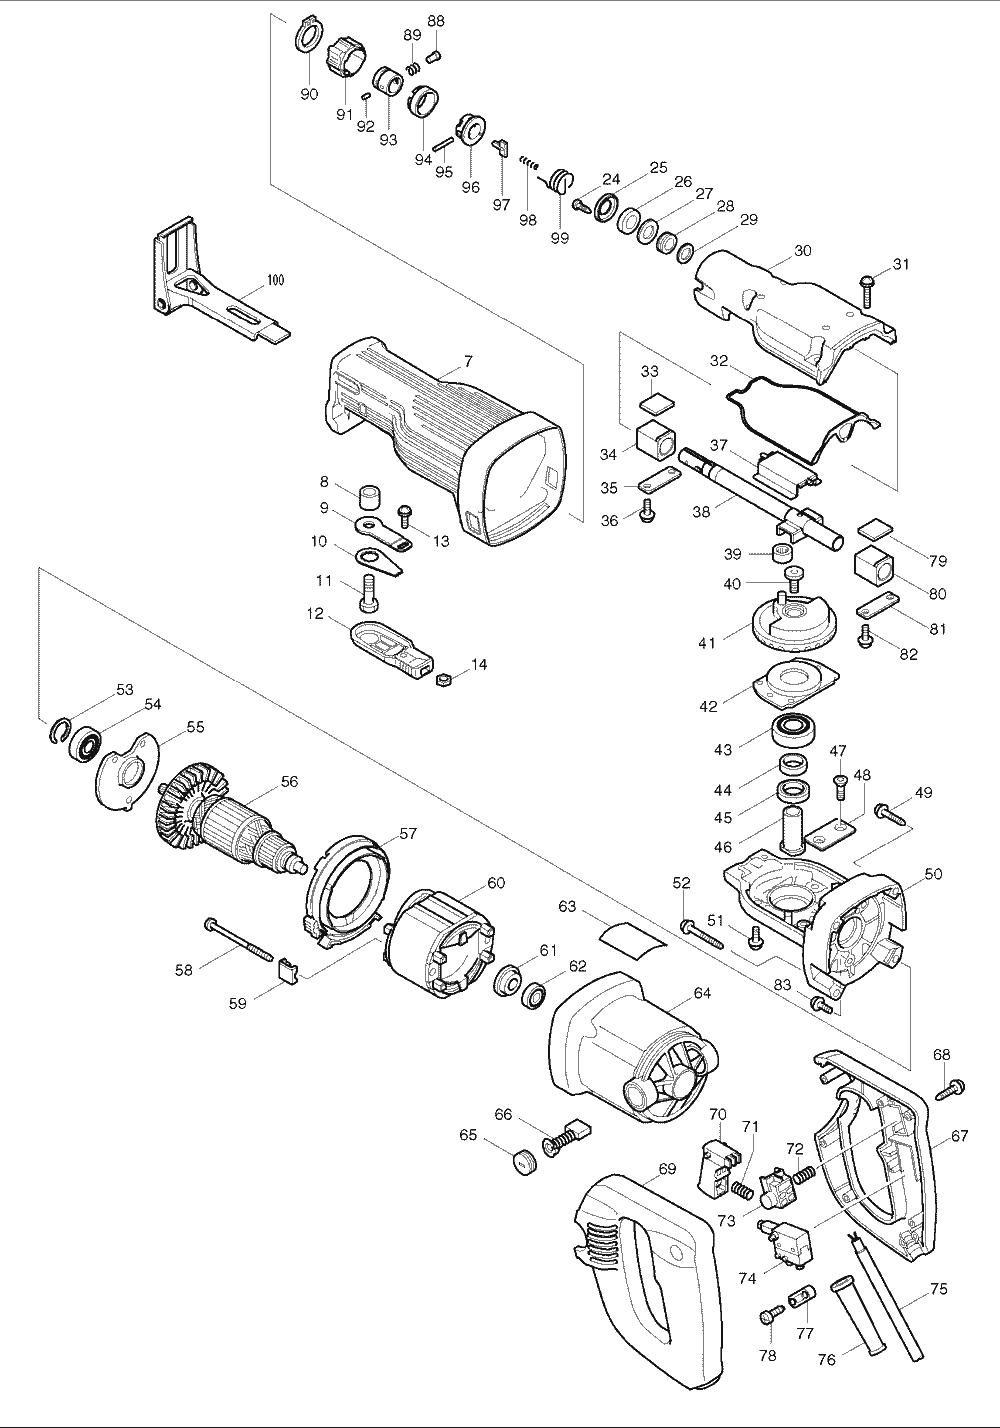 Buy Makita JR3030T Reciprocating Replacement Tool Parts